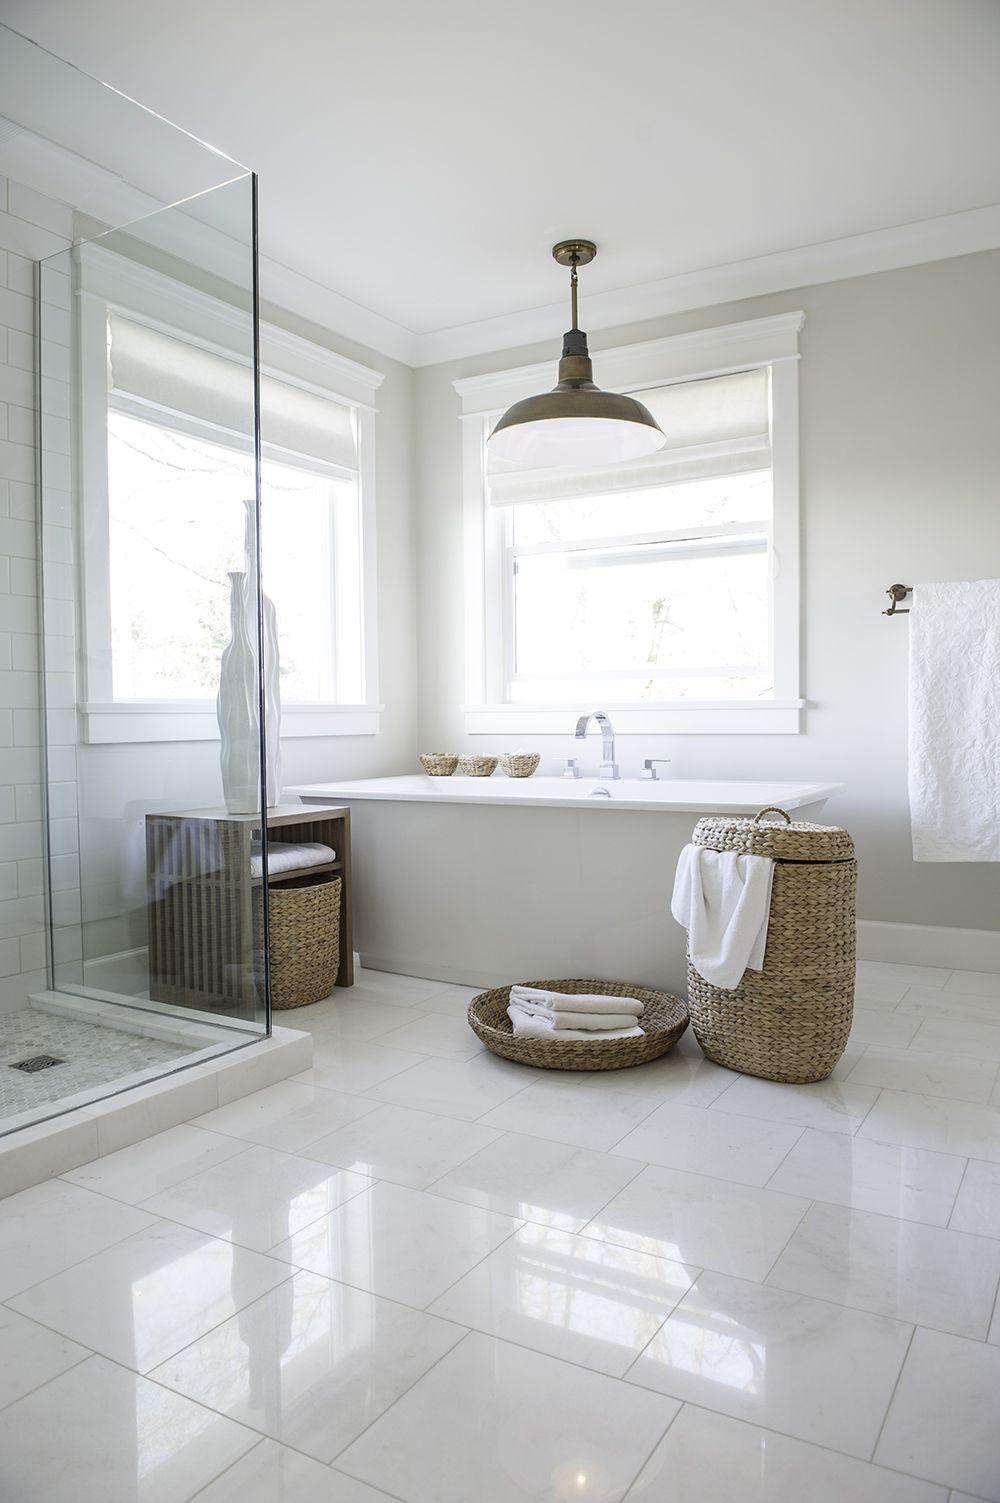 White Bathroom Tracey Ayton Photography White bathroom